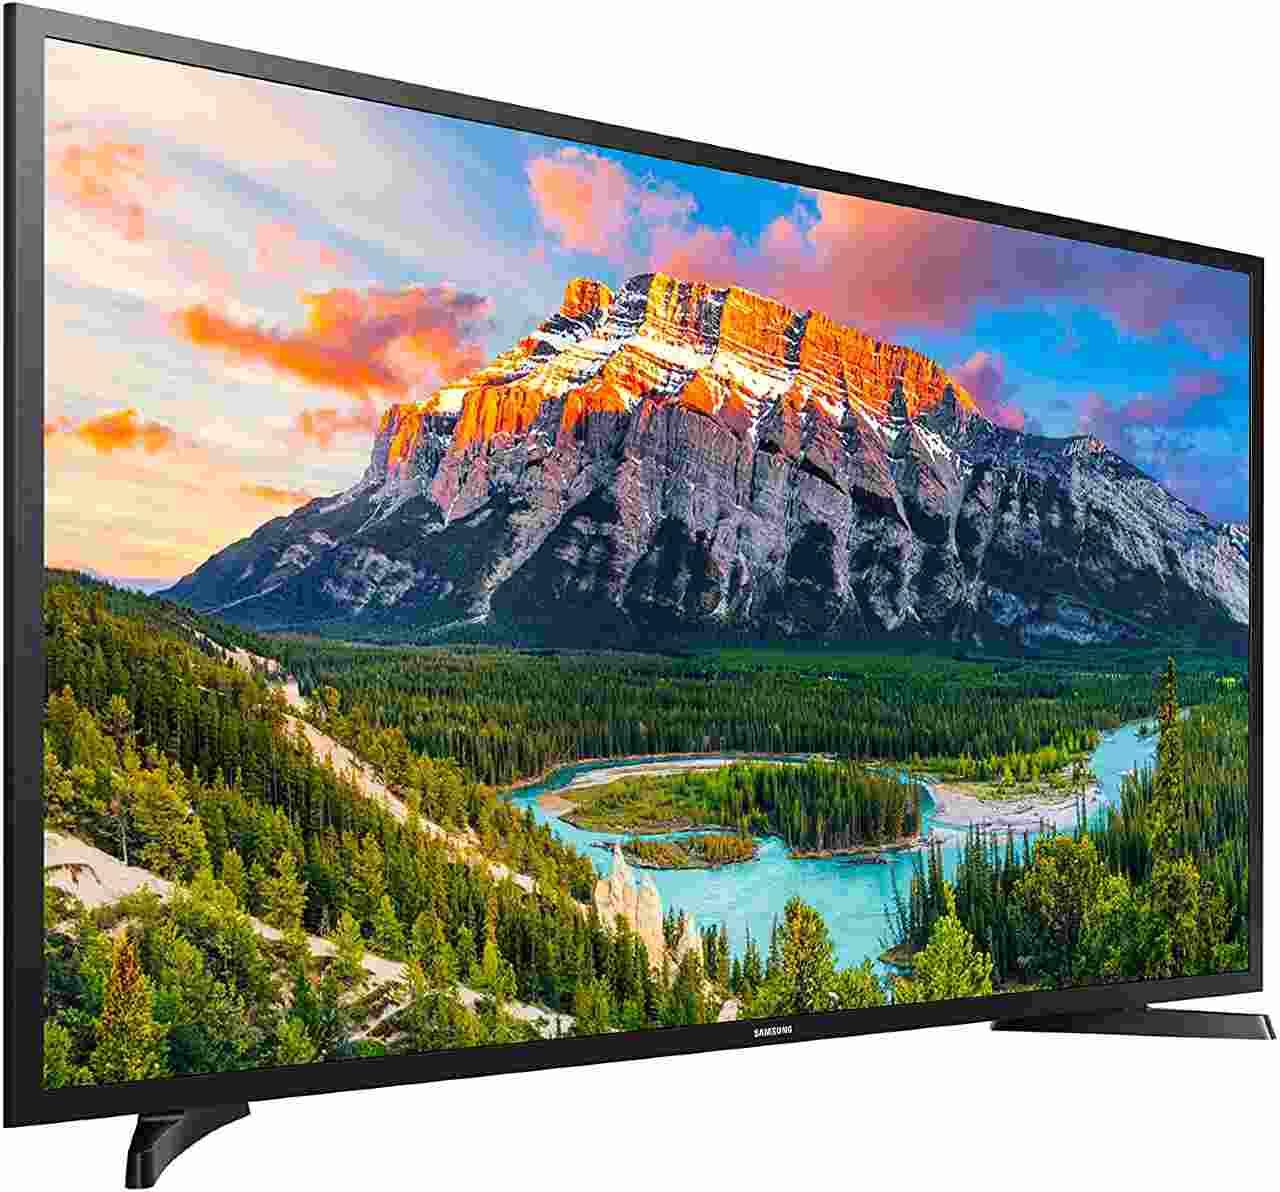 Game Mode Tv Samsung (Samsung)